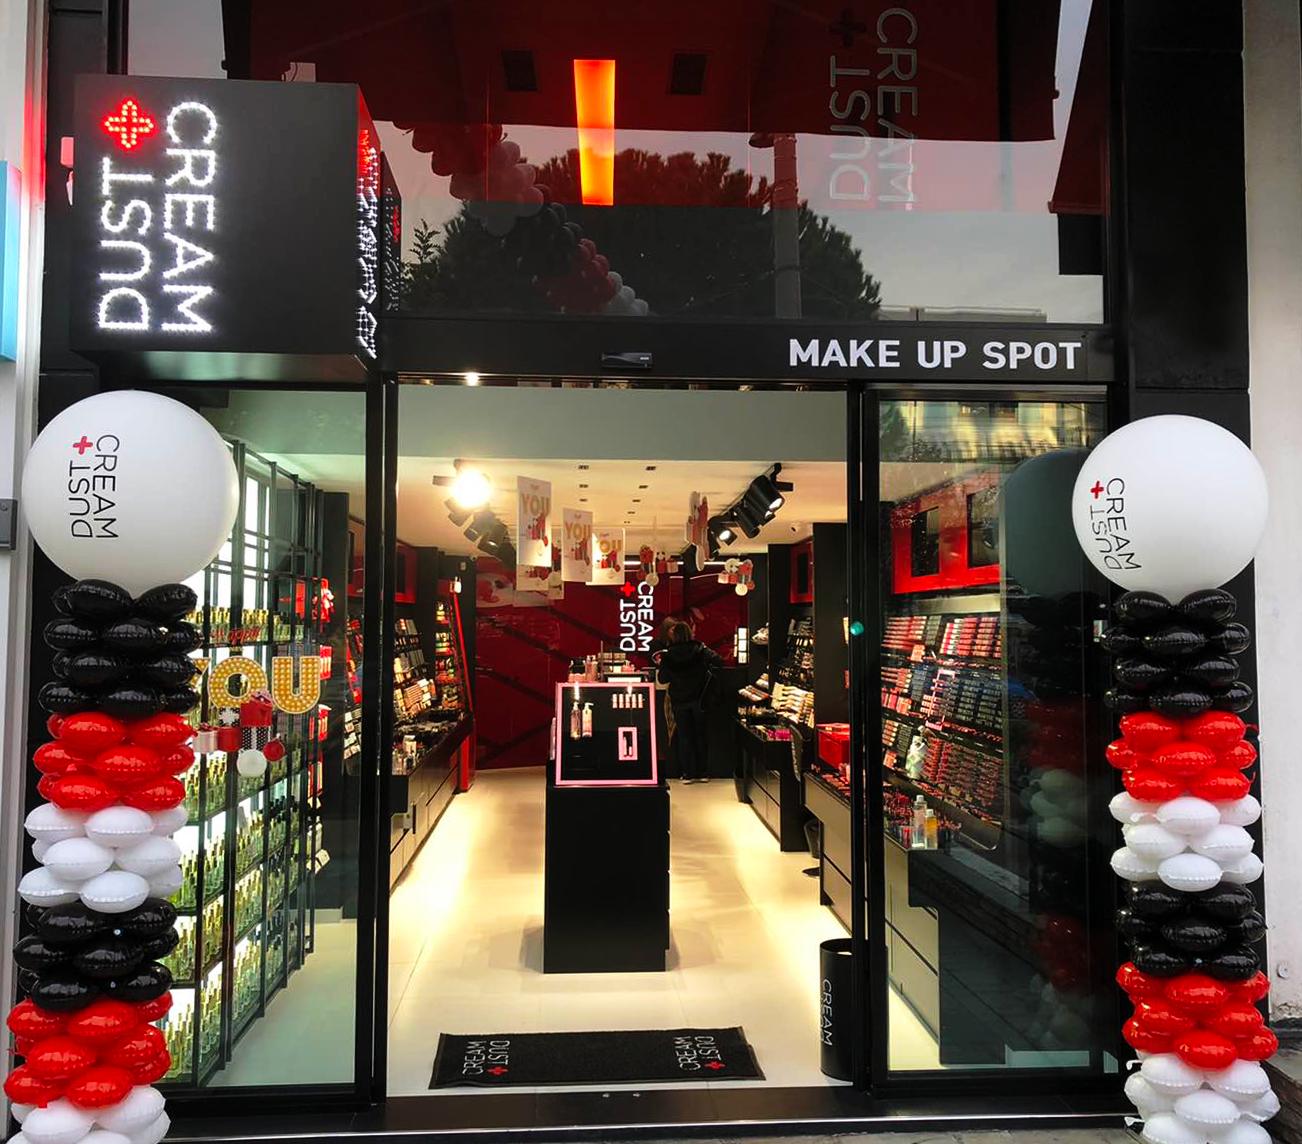 H DUST+CREAM ανοίγει νέο κατάστημα στη Γλυφάδα